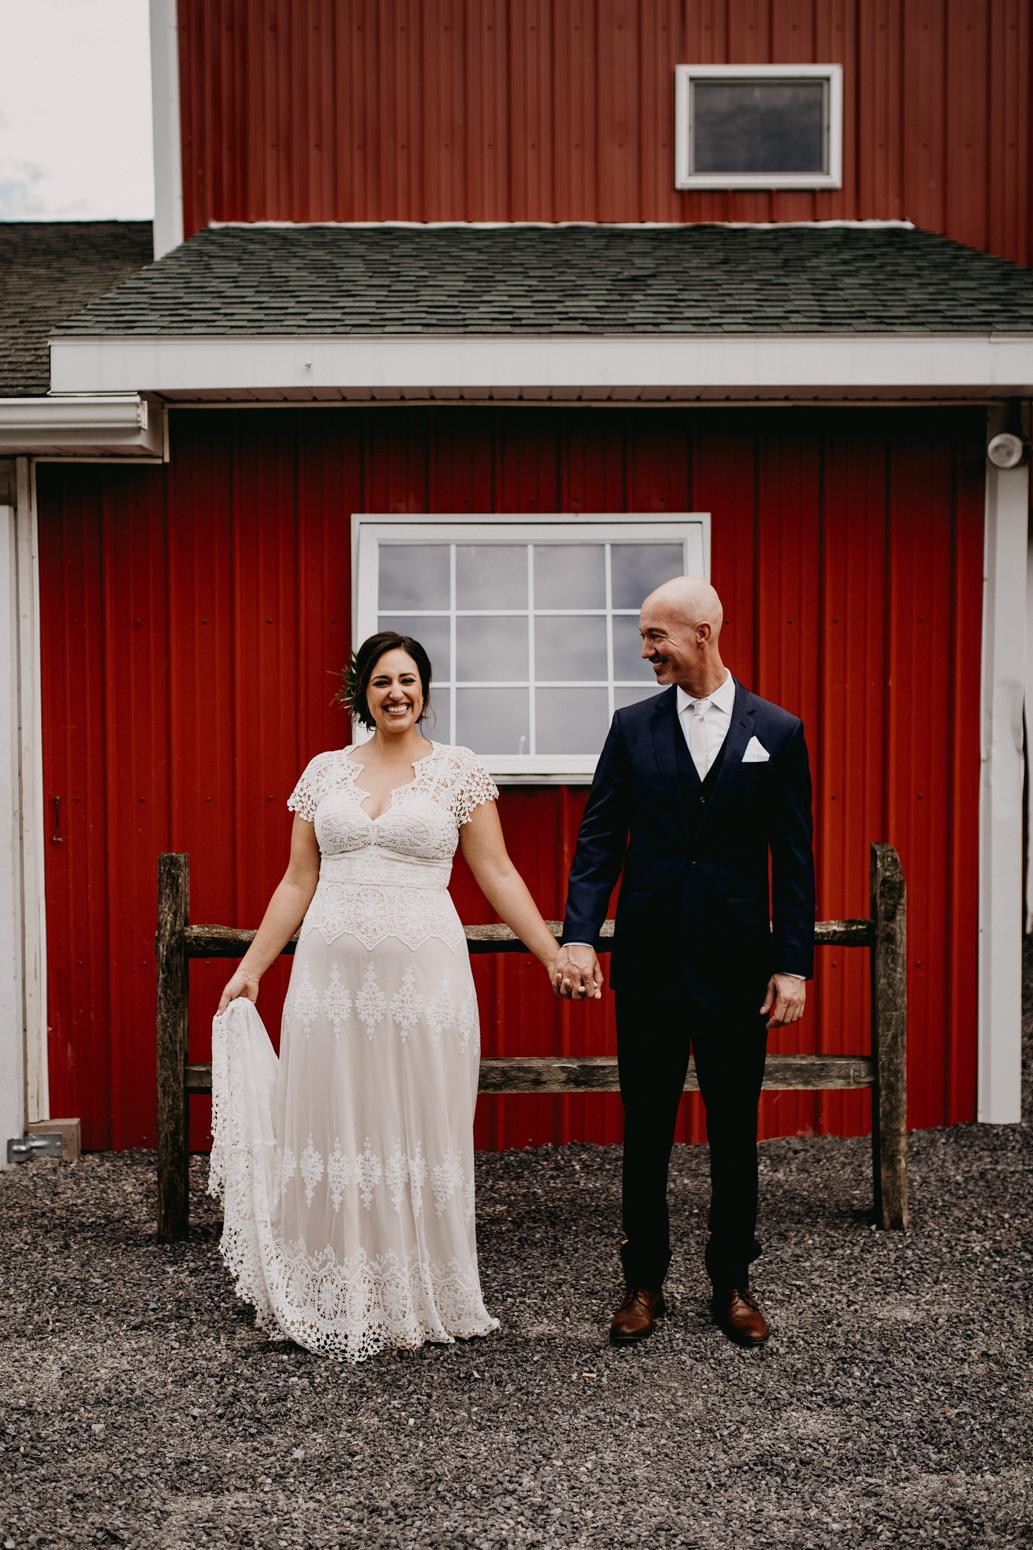 Rochester, NY Wedding Photographer (73 of 133).jpg